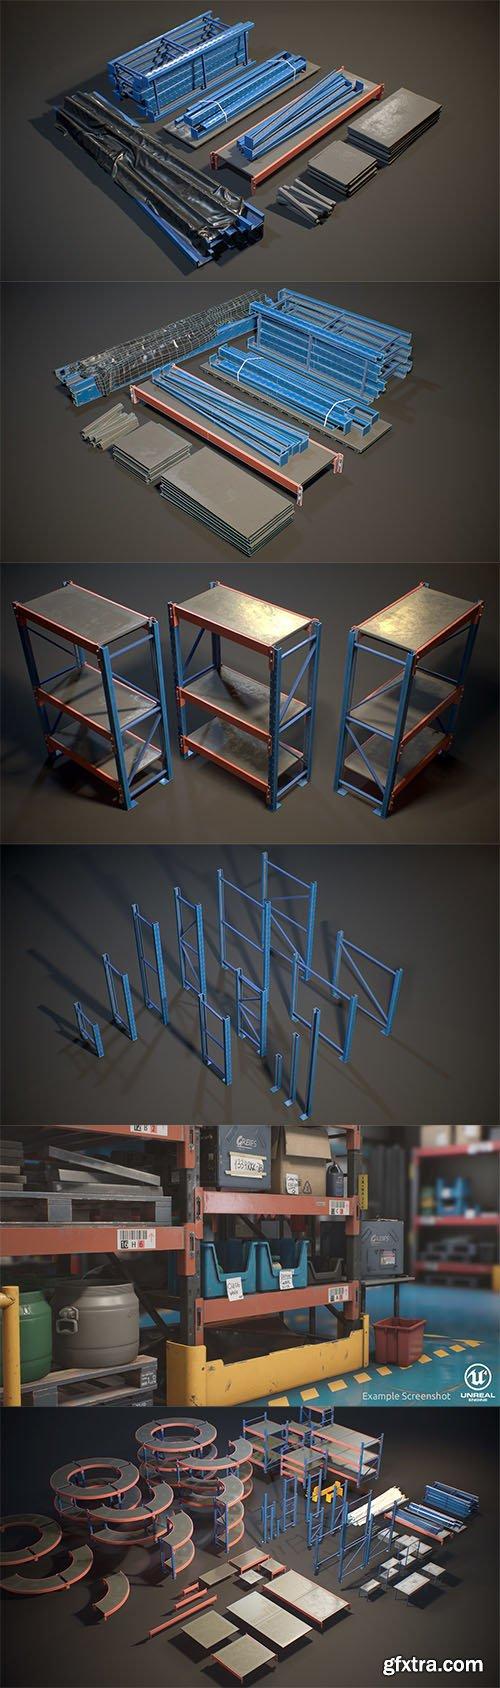 Cubebrush - Storage Rack Collection - [Modular]